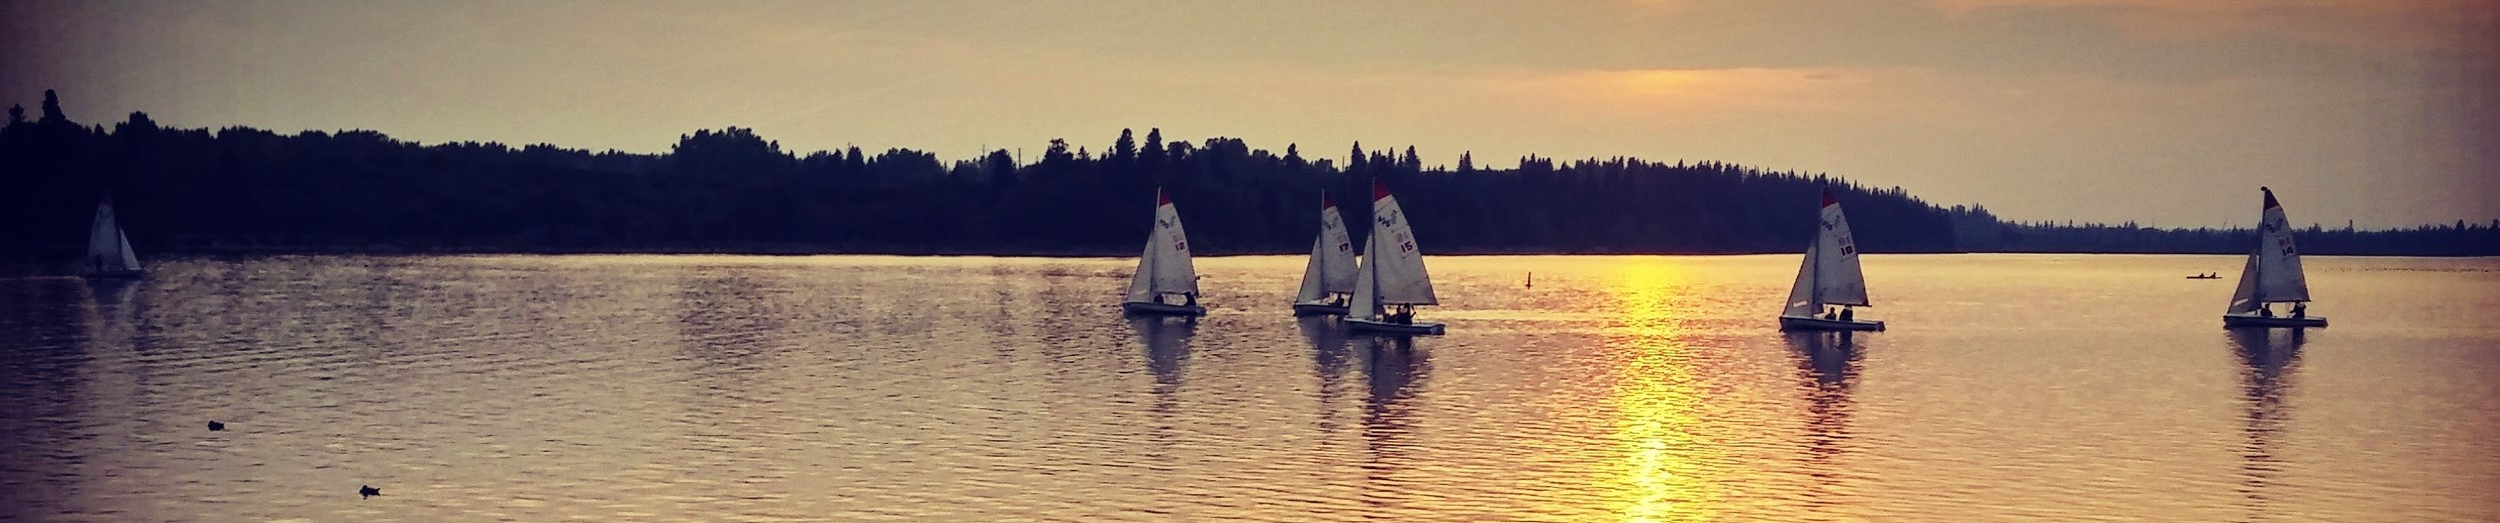 Sail Boats in the Lake on Bike Ride